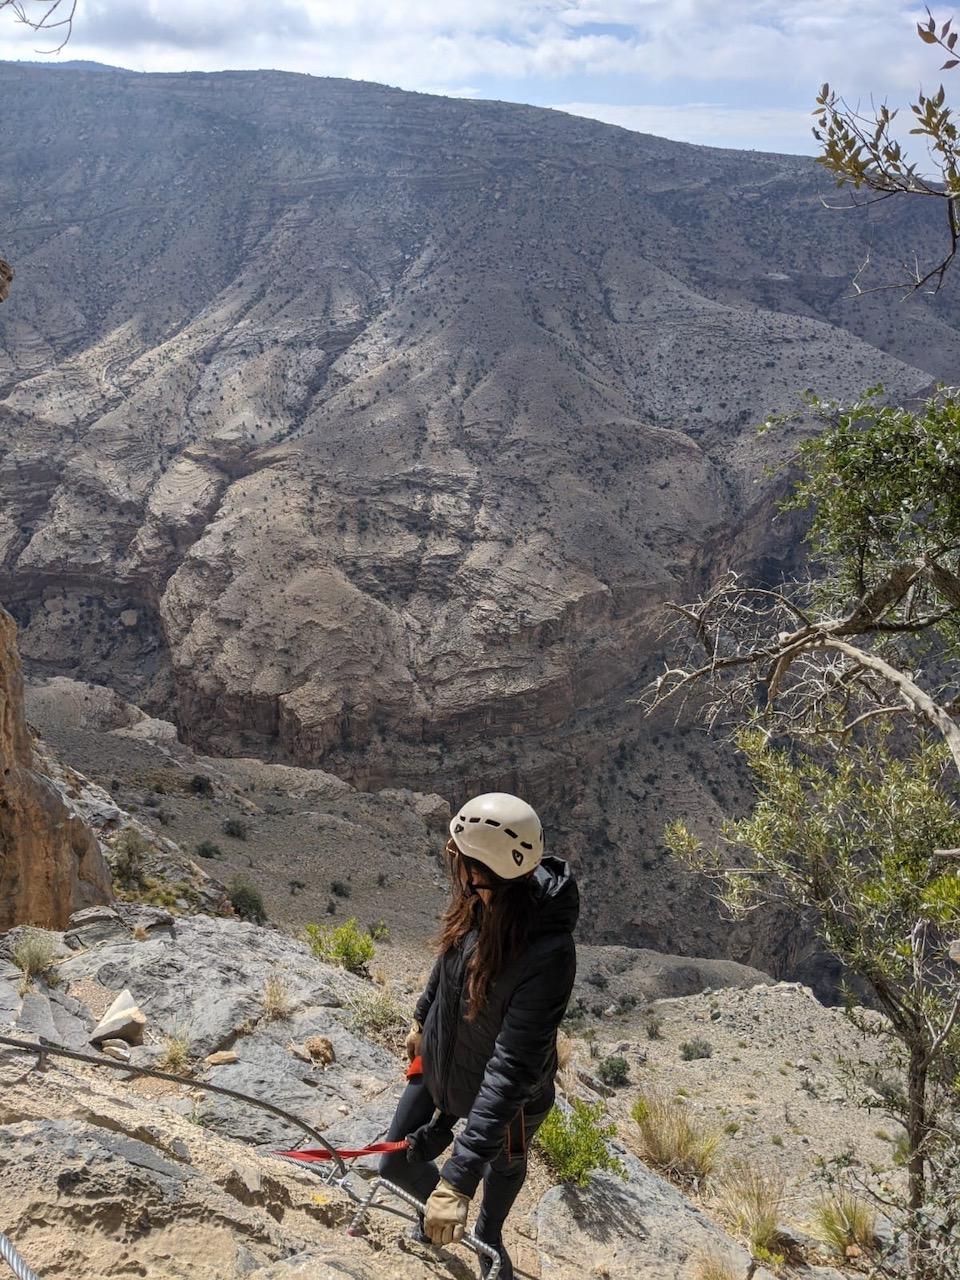 Alila Jabal Akhdar - Rondreis Oman 9 dagen tips - mooiste hotel van Oman - Via ferrata Oman